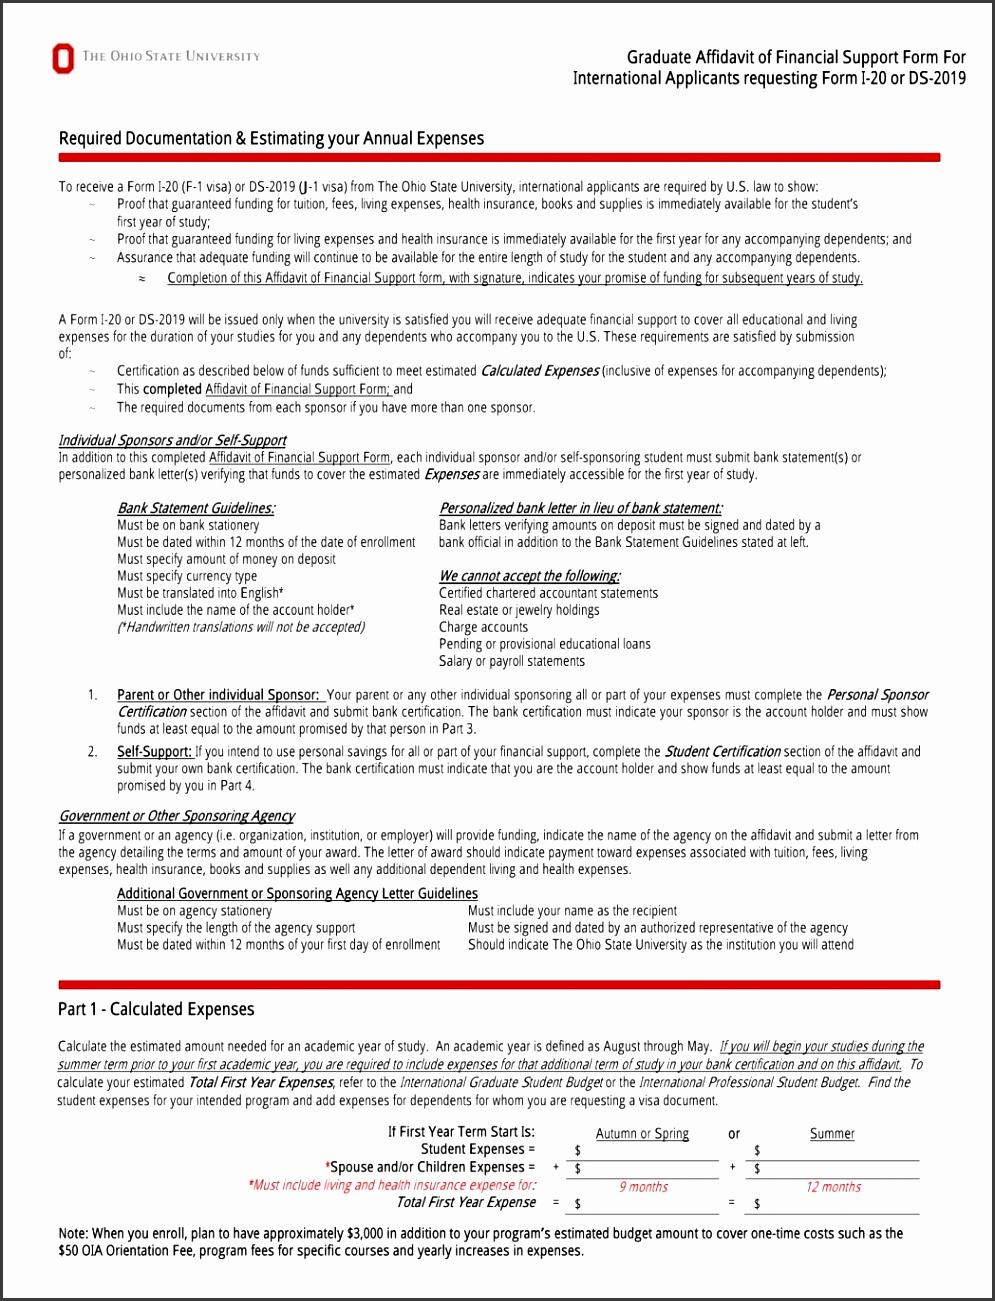 19 free affidavit forms form ds 2019 i 20 of financial supp vawebs 19 free affidavit forms form ds 2019 i 20 of financial supp pdf sample fee